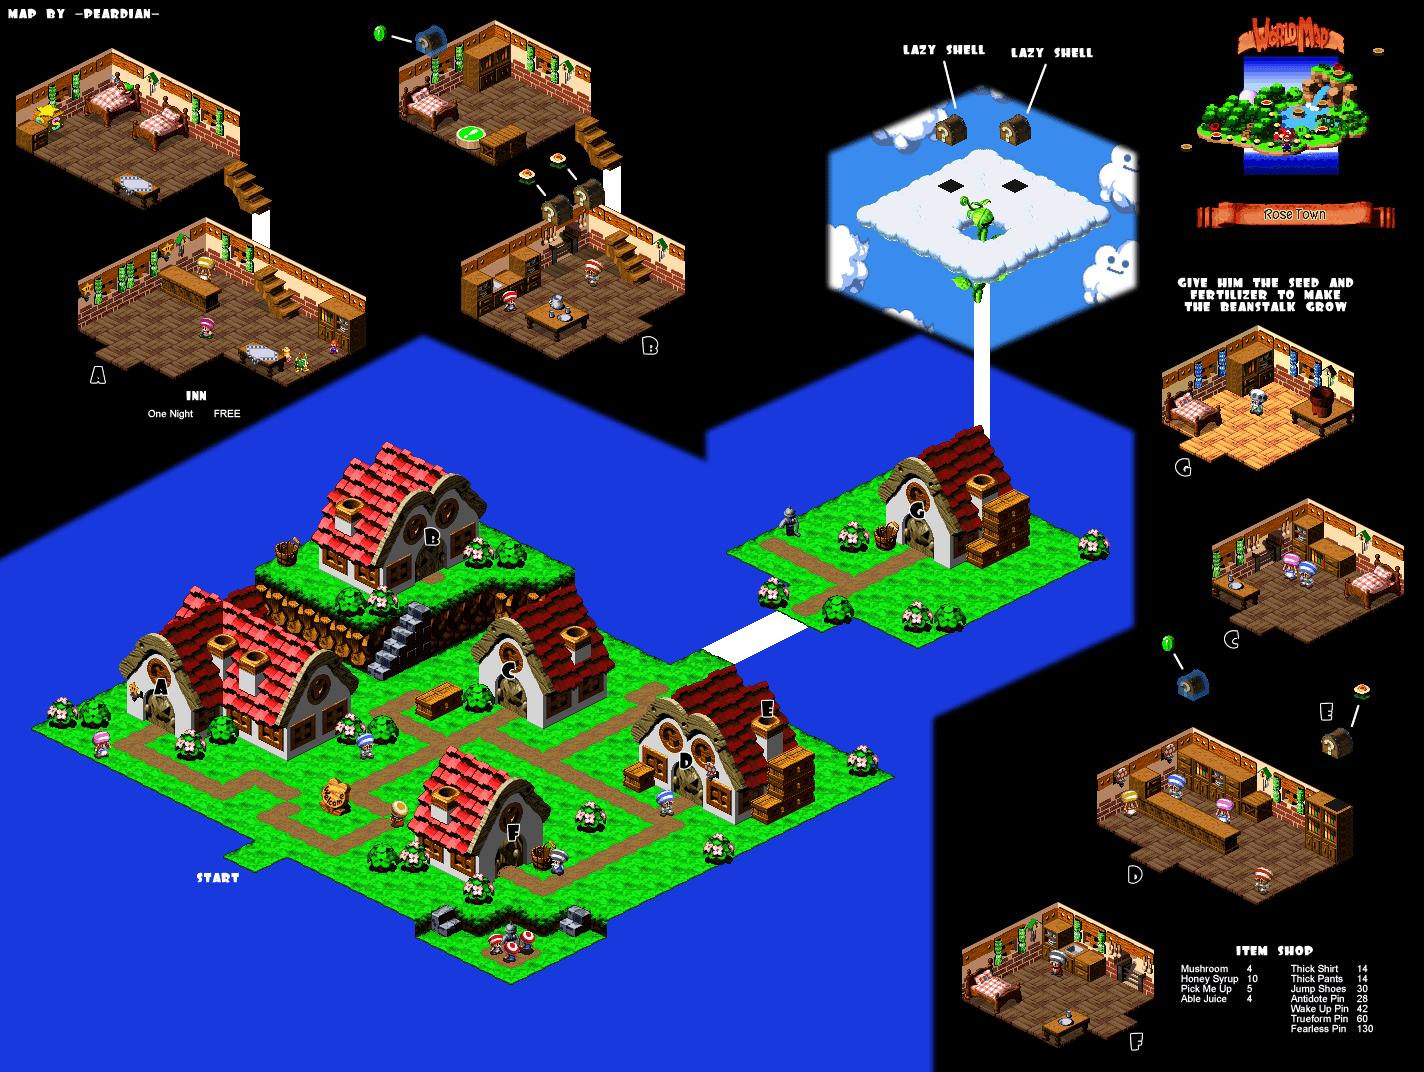 Super Mario RPG Open World Randomizer